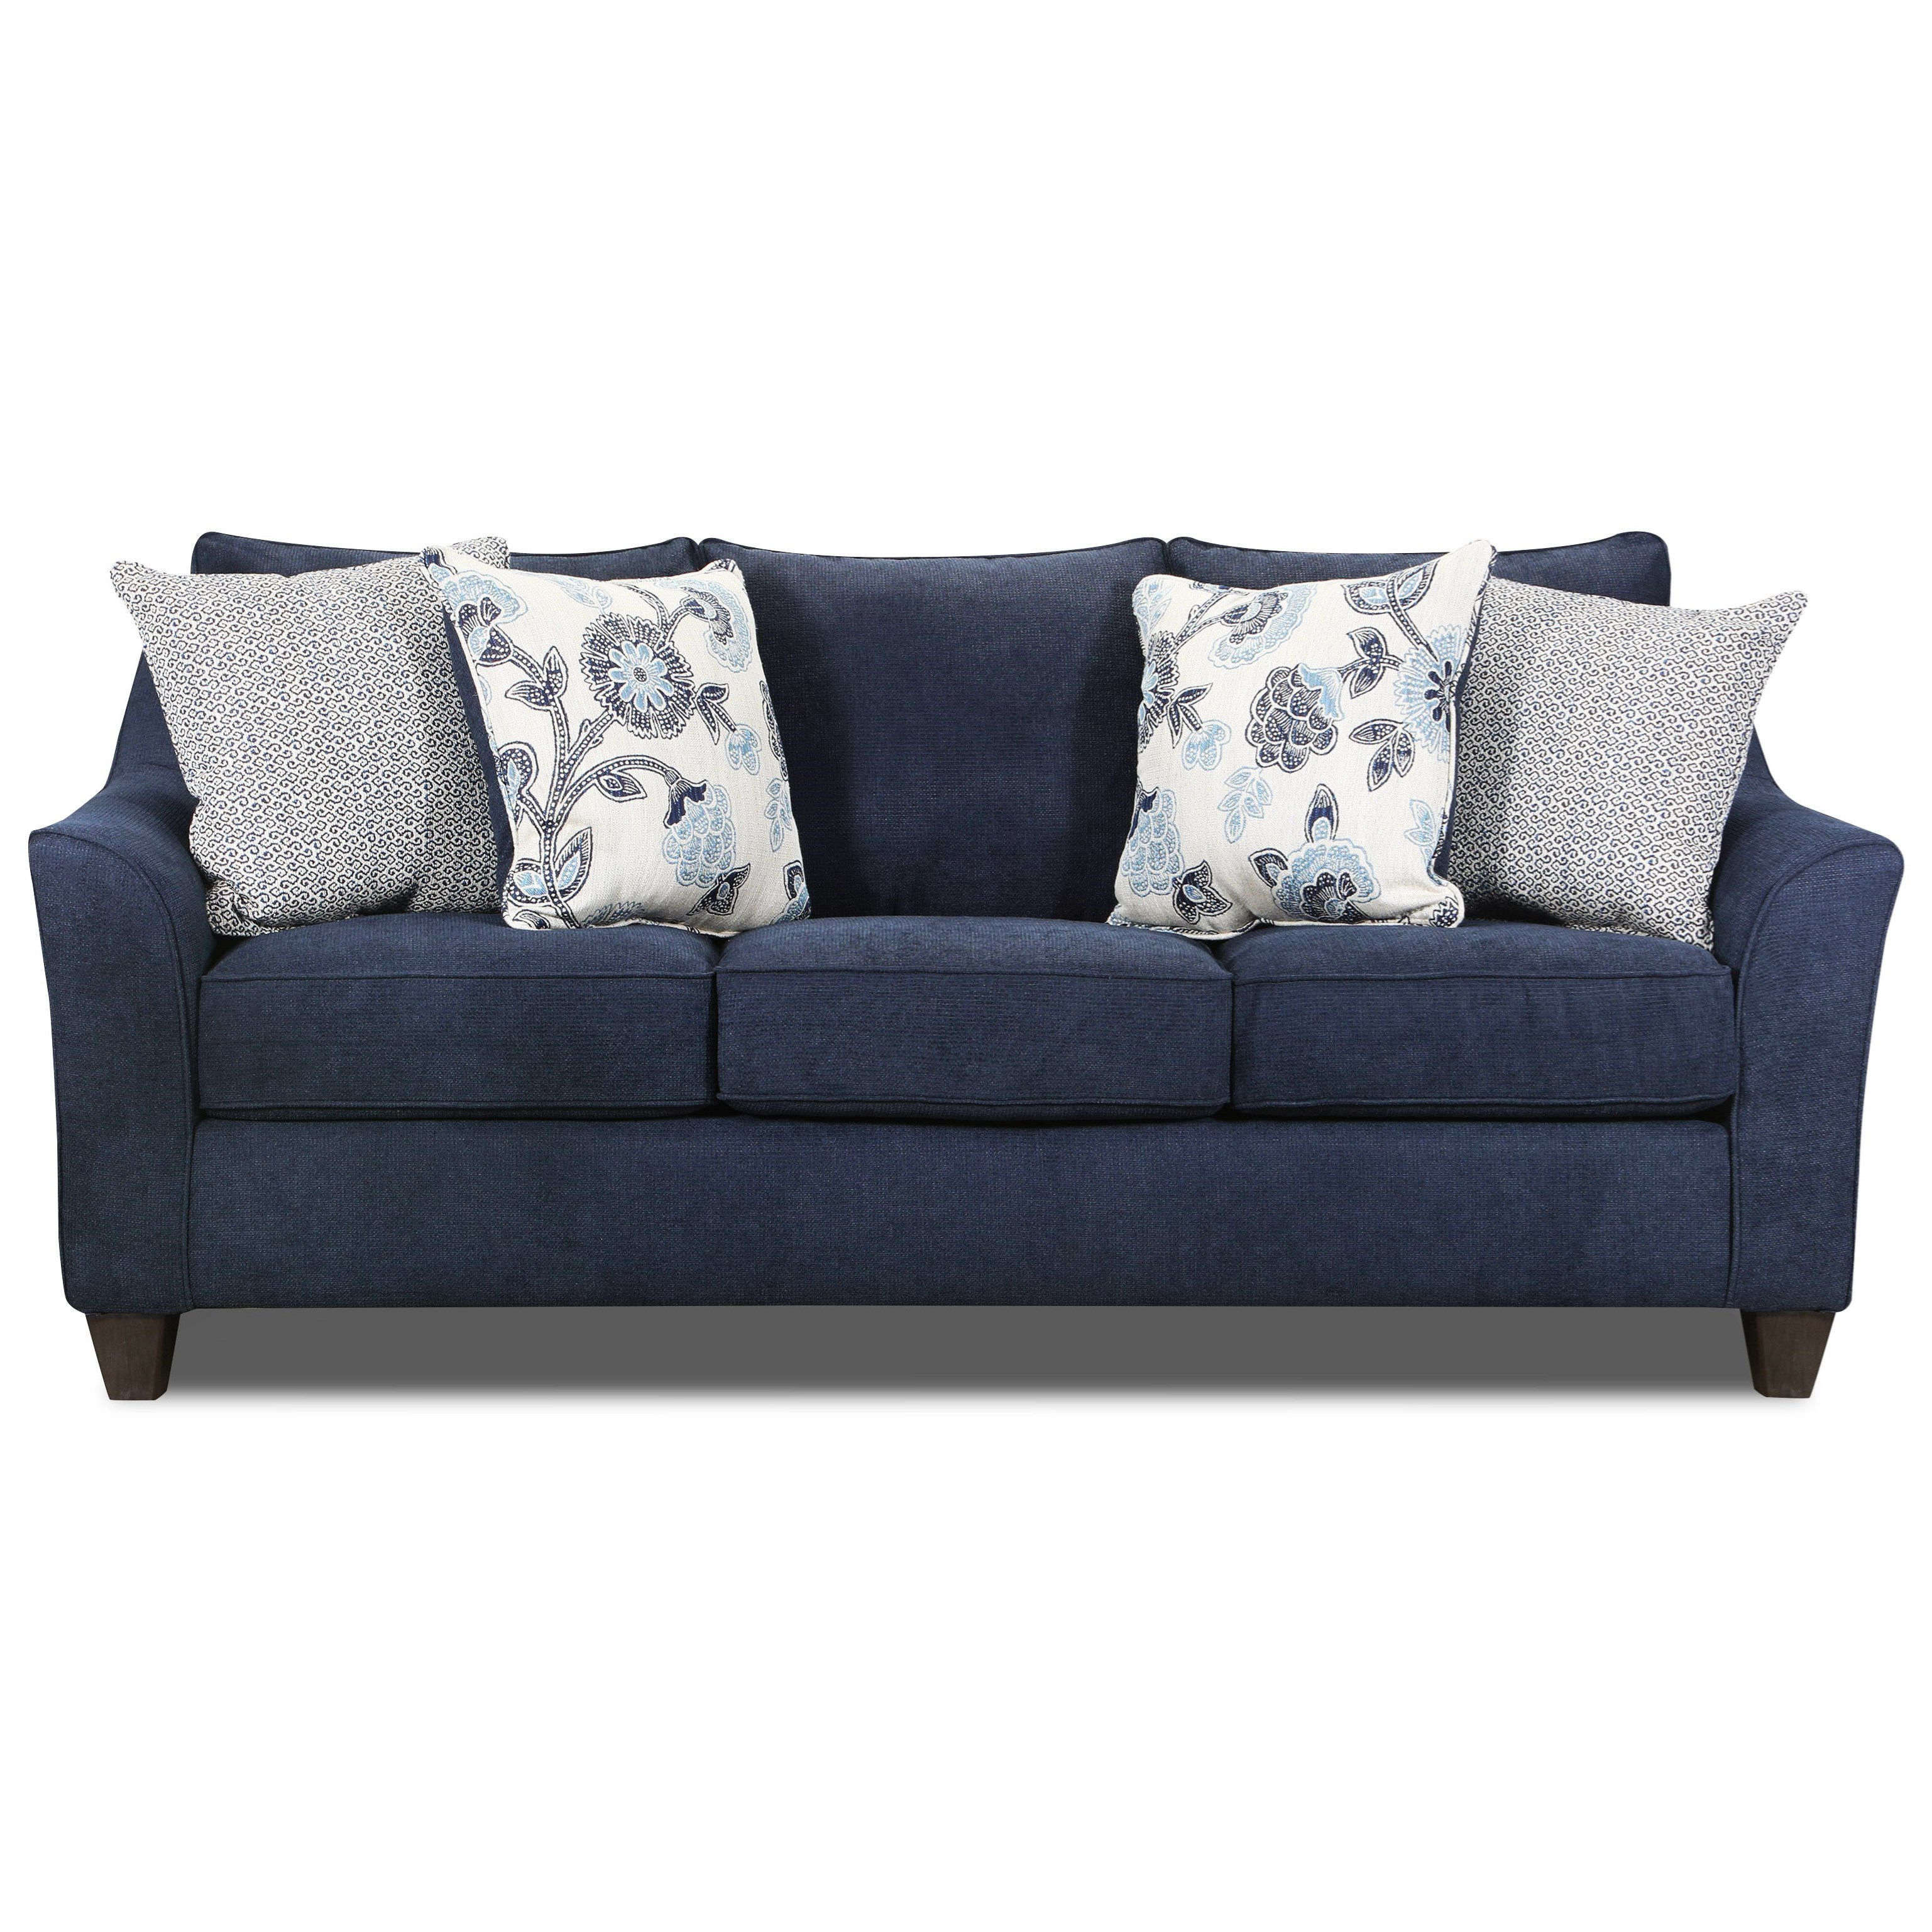 4330 Sofa by United Furniture Industries at Pilgrim Furniture City